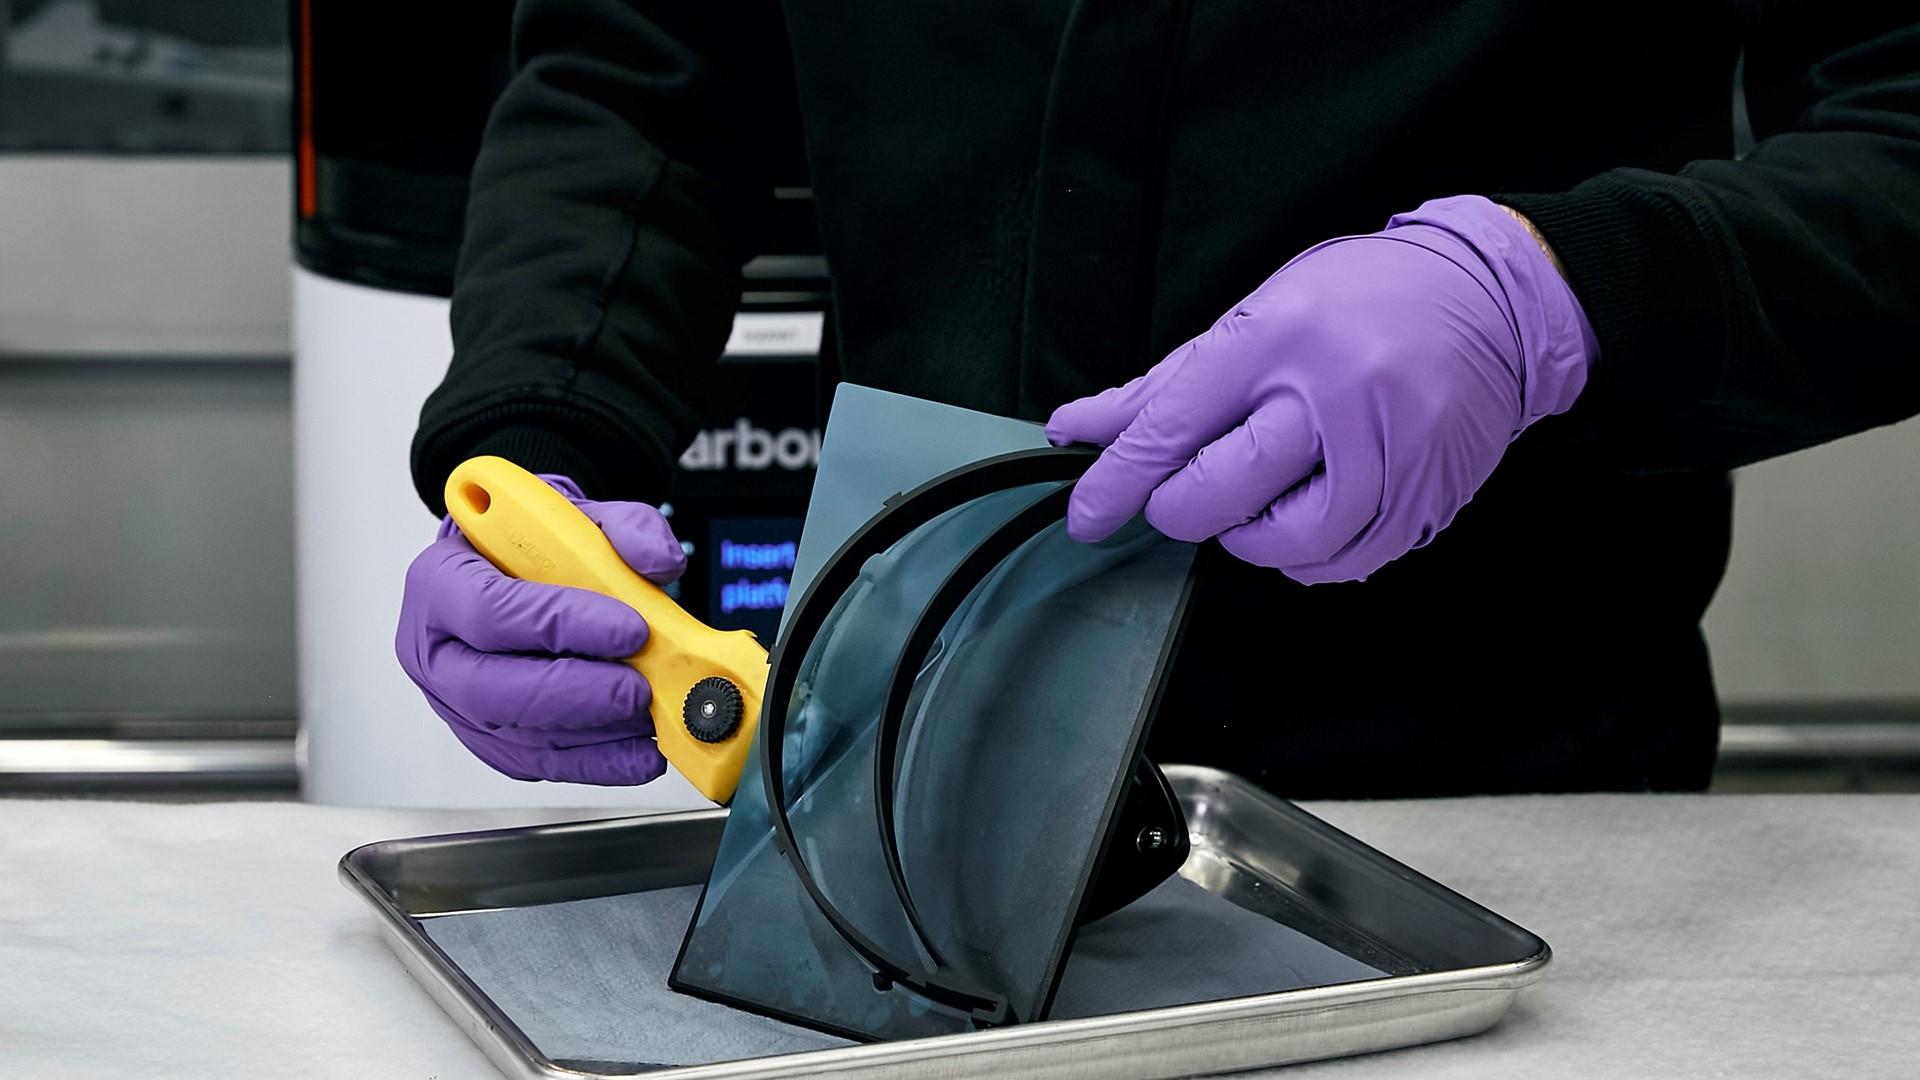 Automobili Lamborghini starts production of surgical masks and medical shields for use in Coronavirus pandemic - Image 4